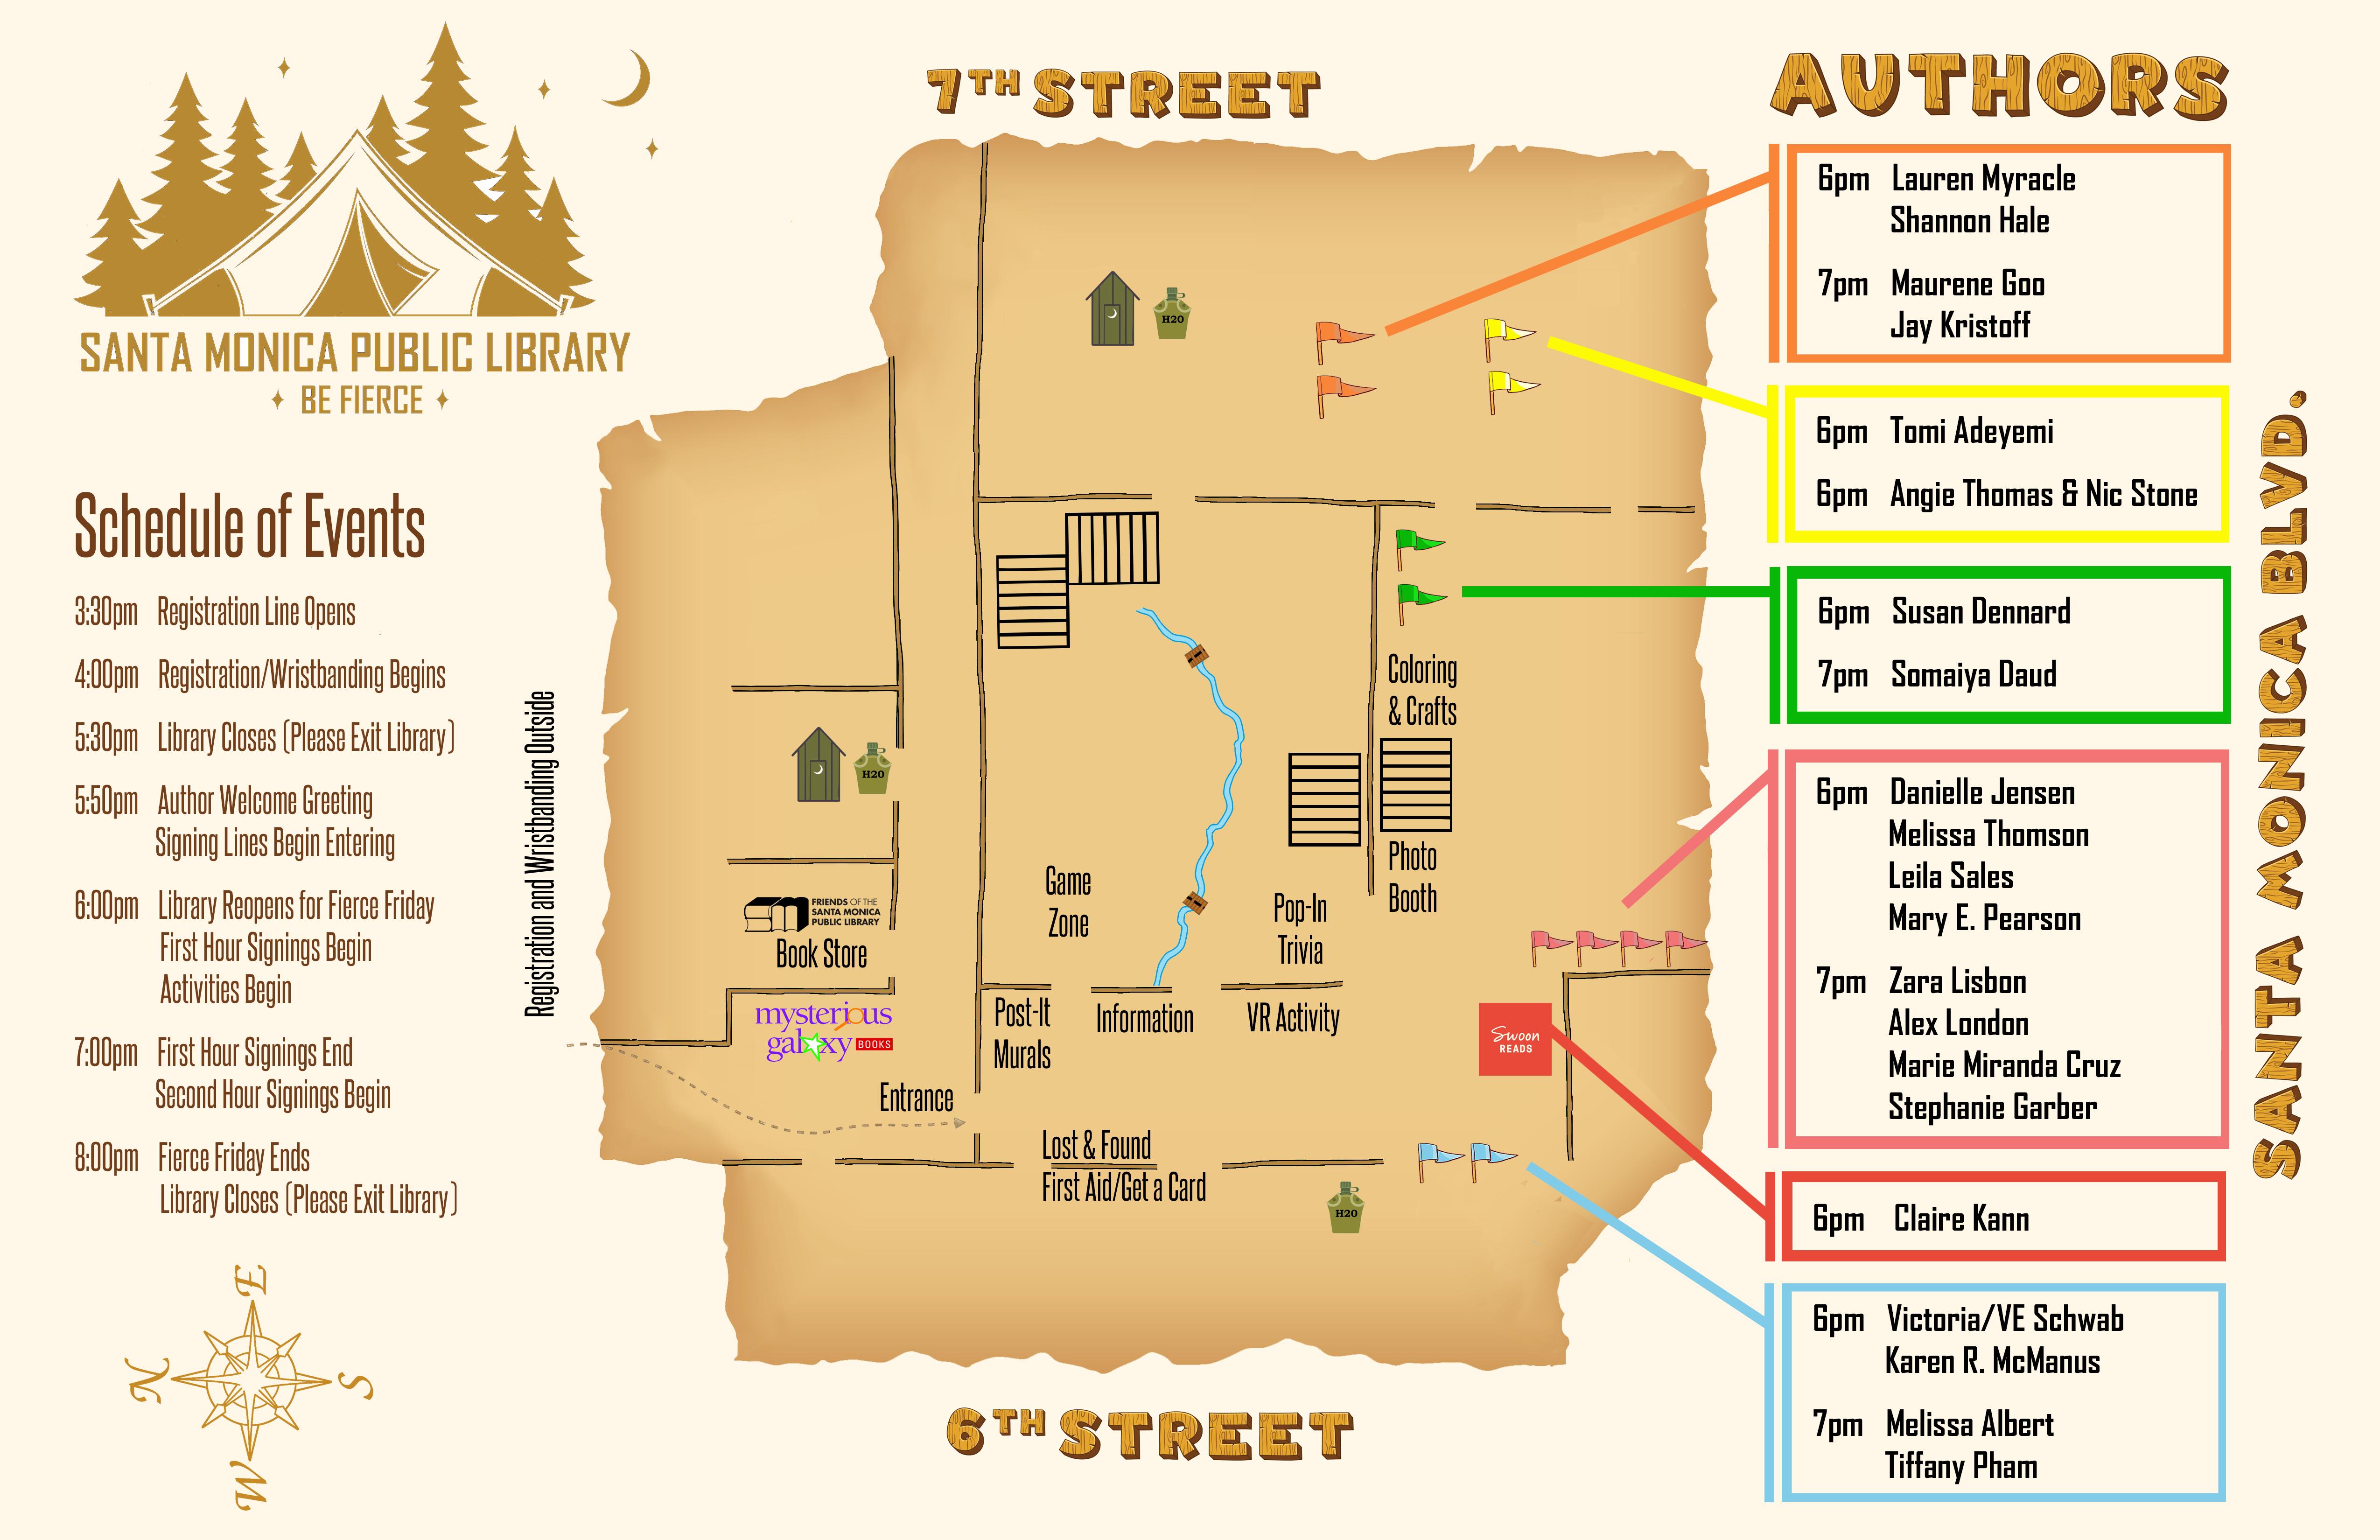 Location & Accessibility — YALLWEST on westwood santa monica map, hotel santa monica map, santa monica tourist map, 7984 santa monica blvd map, santa monica street parking, ucla santa monica map,